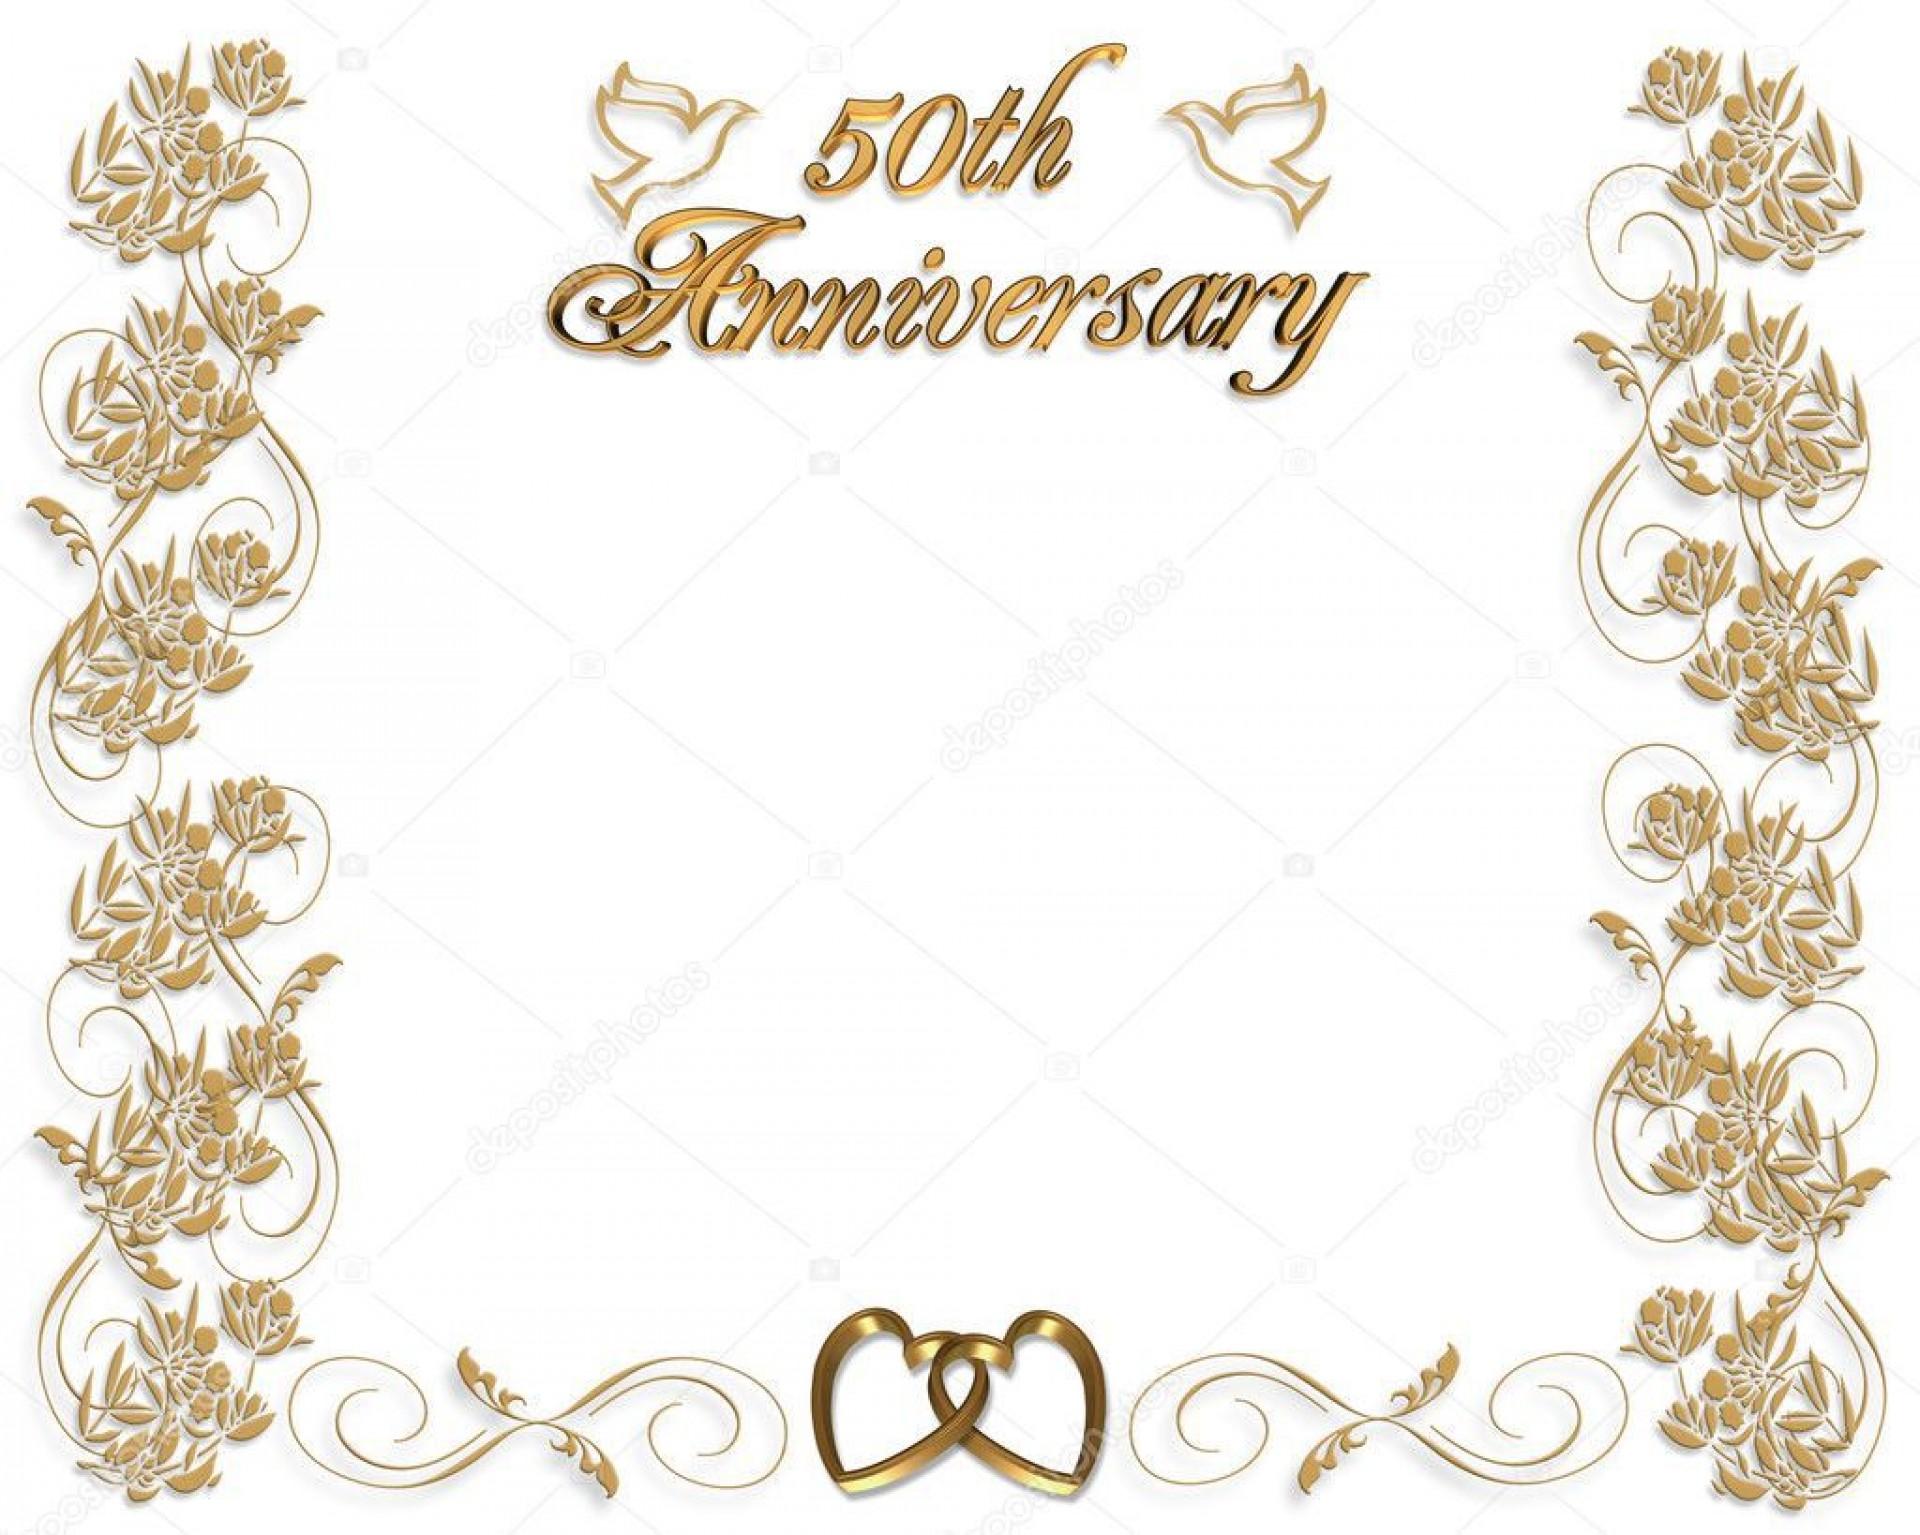 009 Fantastic 50th Wedding Anniversary Invitation Design Highest Quality  Designs Wording Sample Card Template Free Download1920